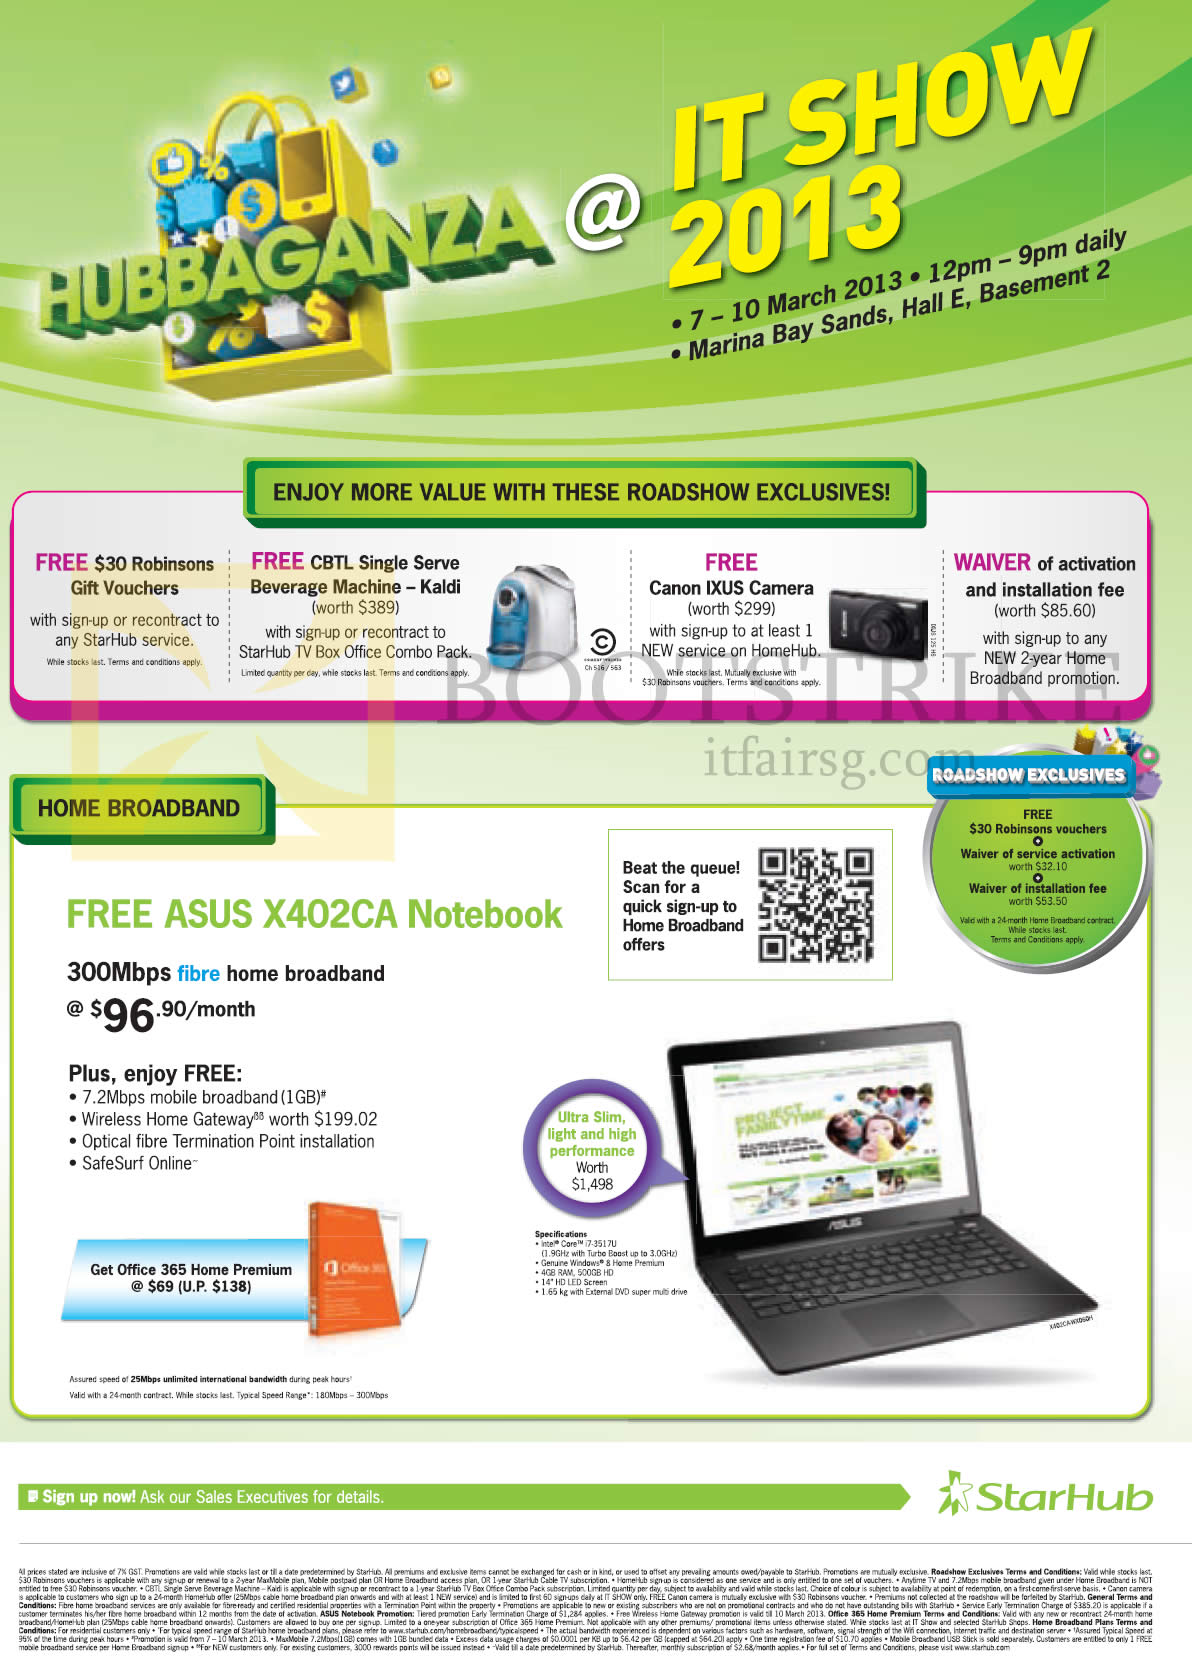 Broadband Fibre 300Mbps Free ASUS X402CA Notebook, Free